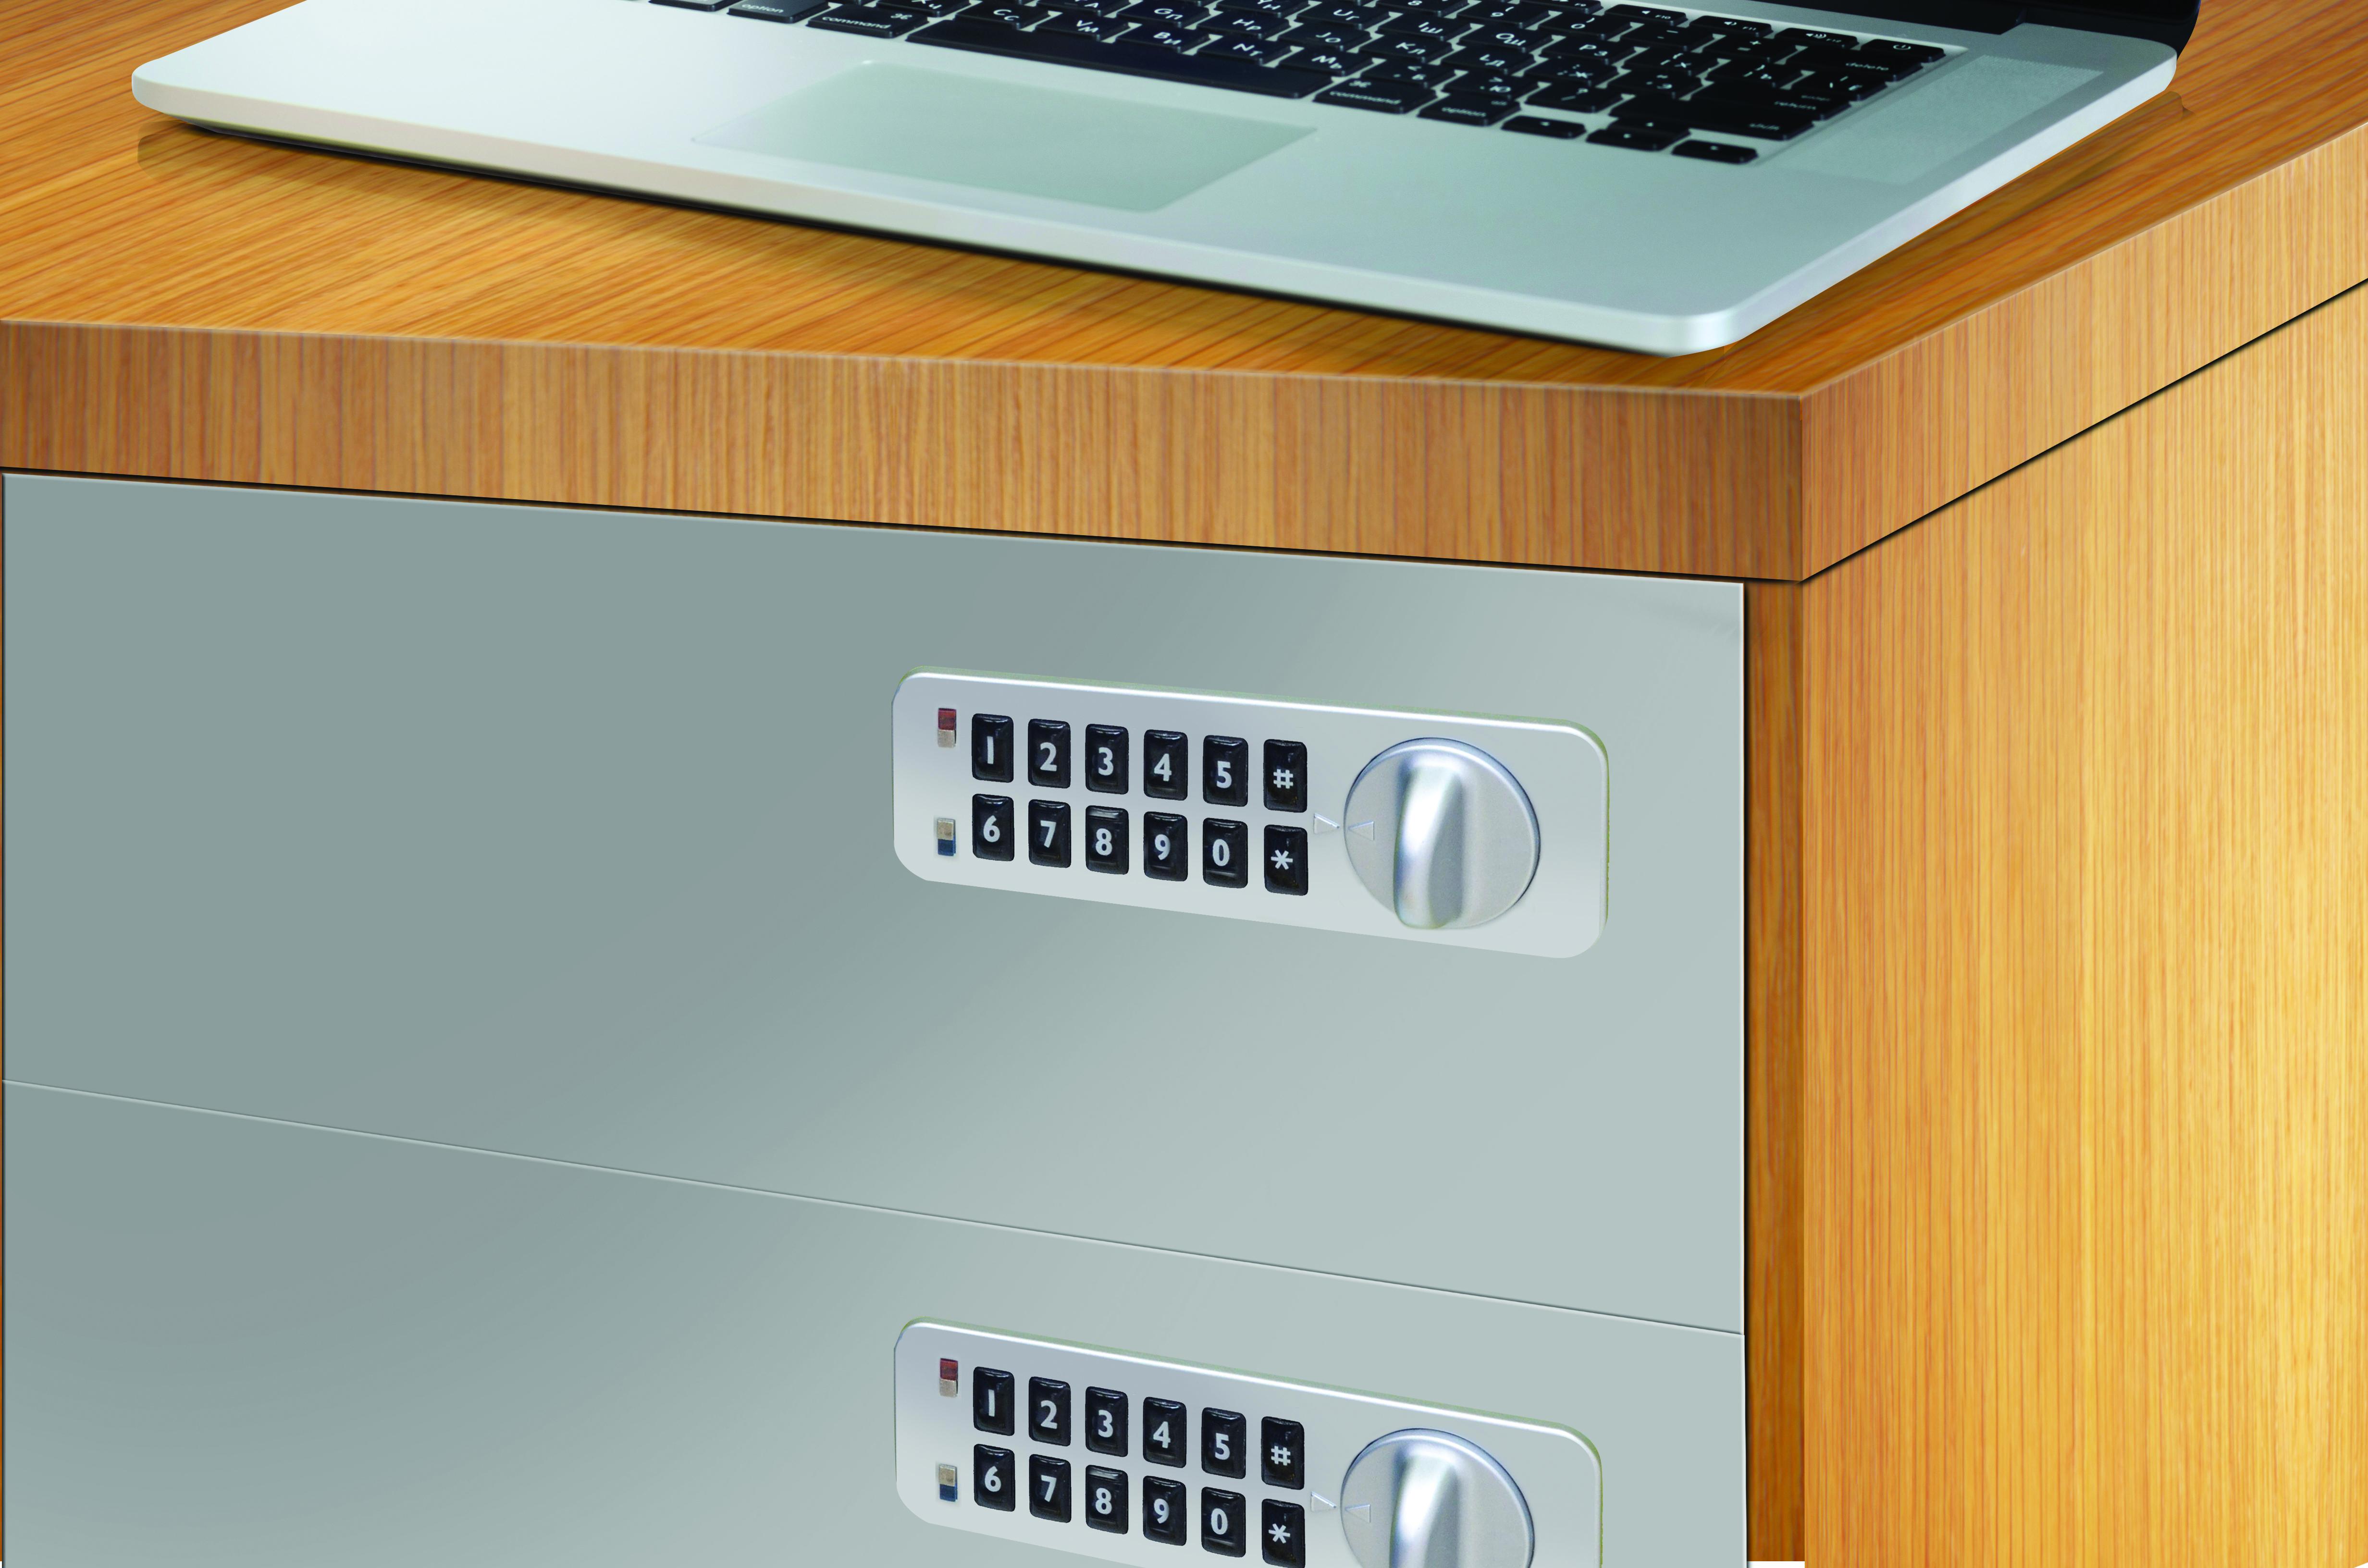 Filing cabinet lock